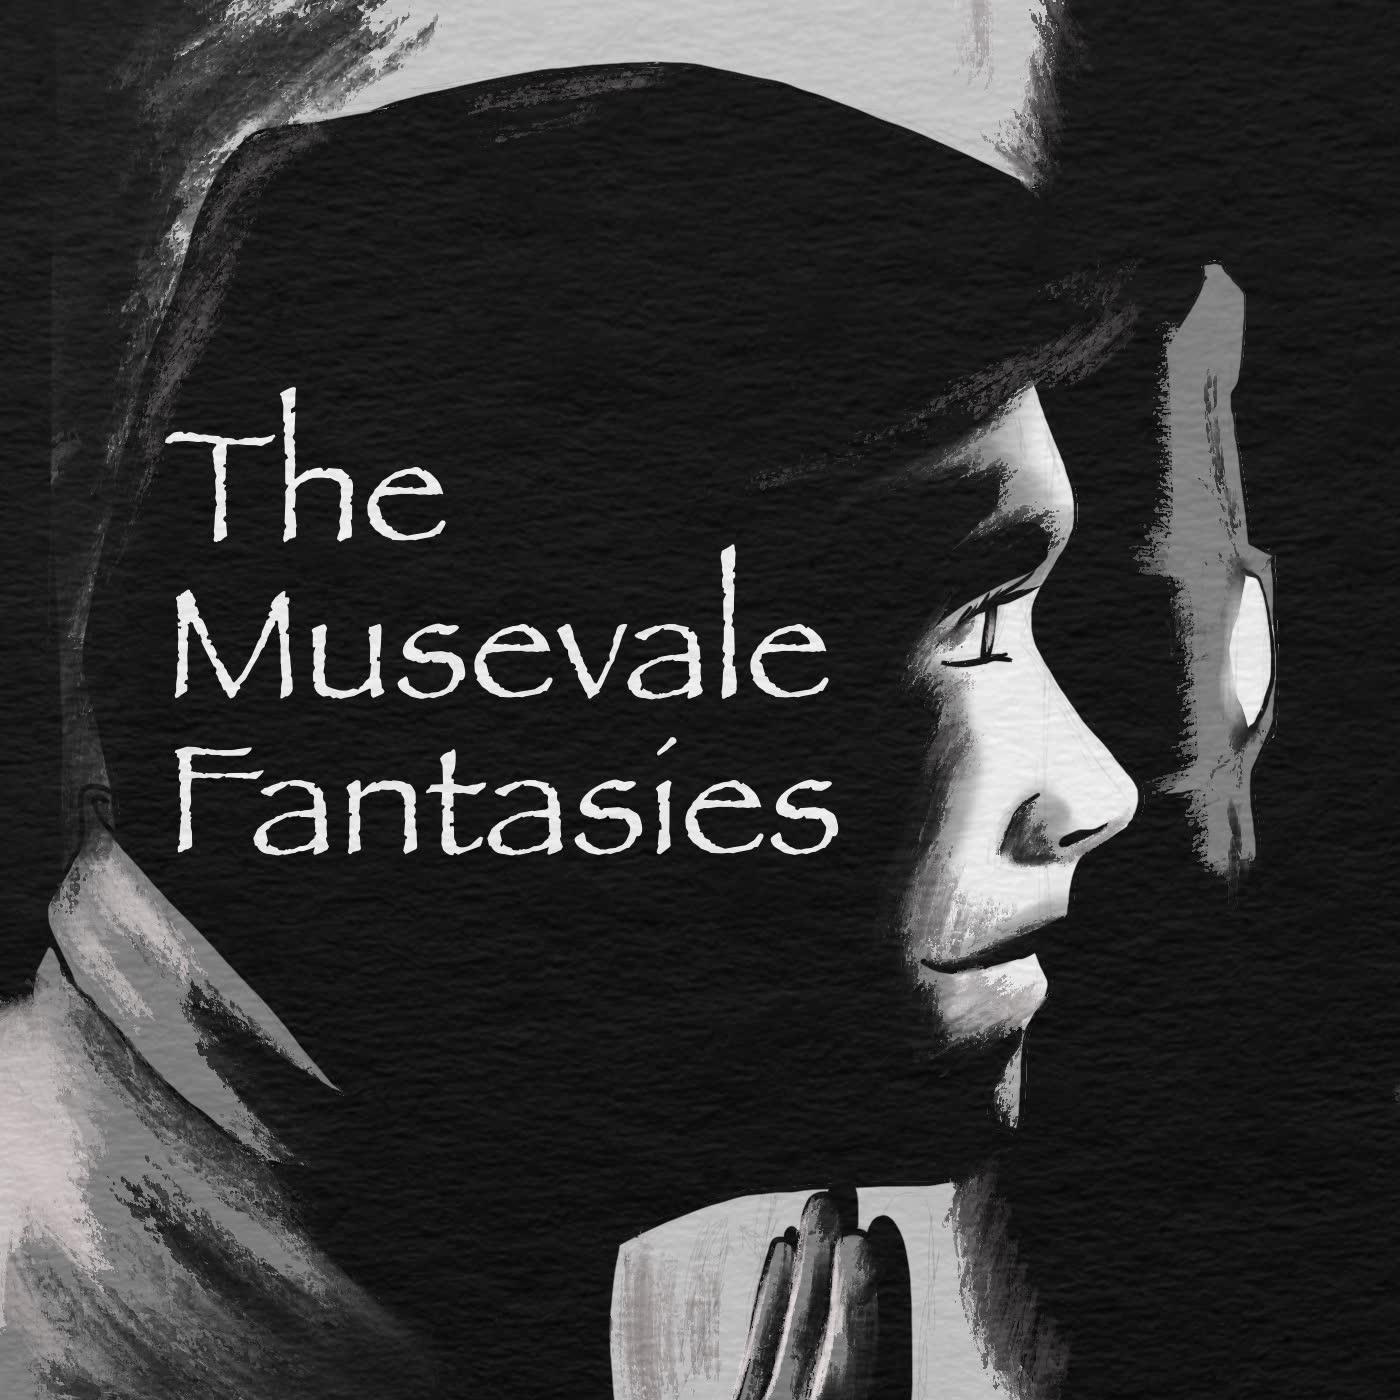 The Musevale Fantasies